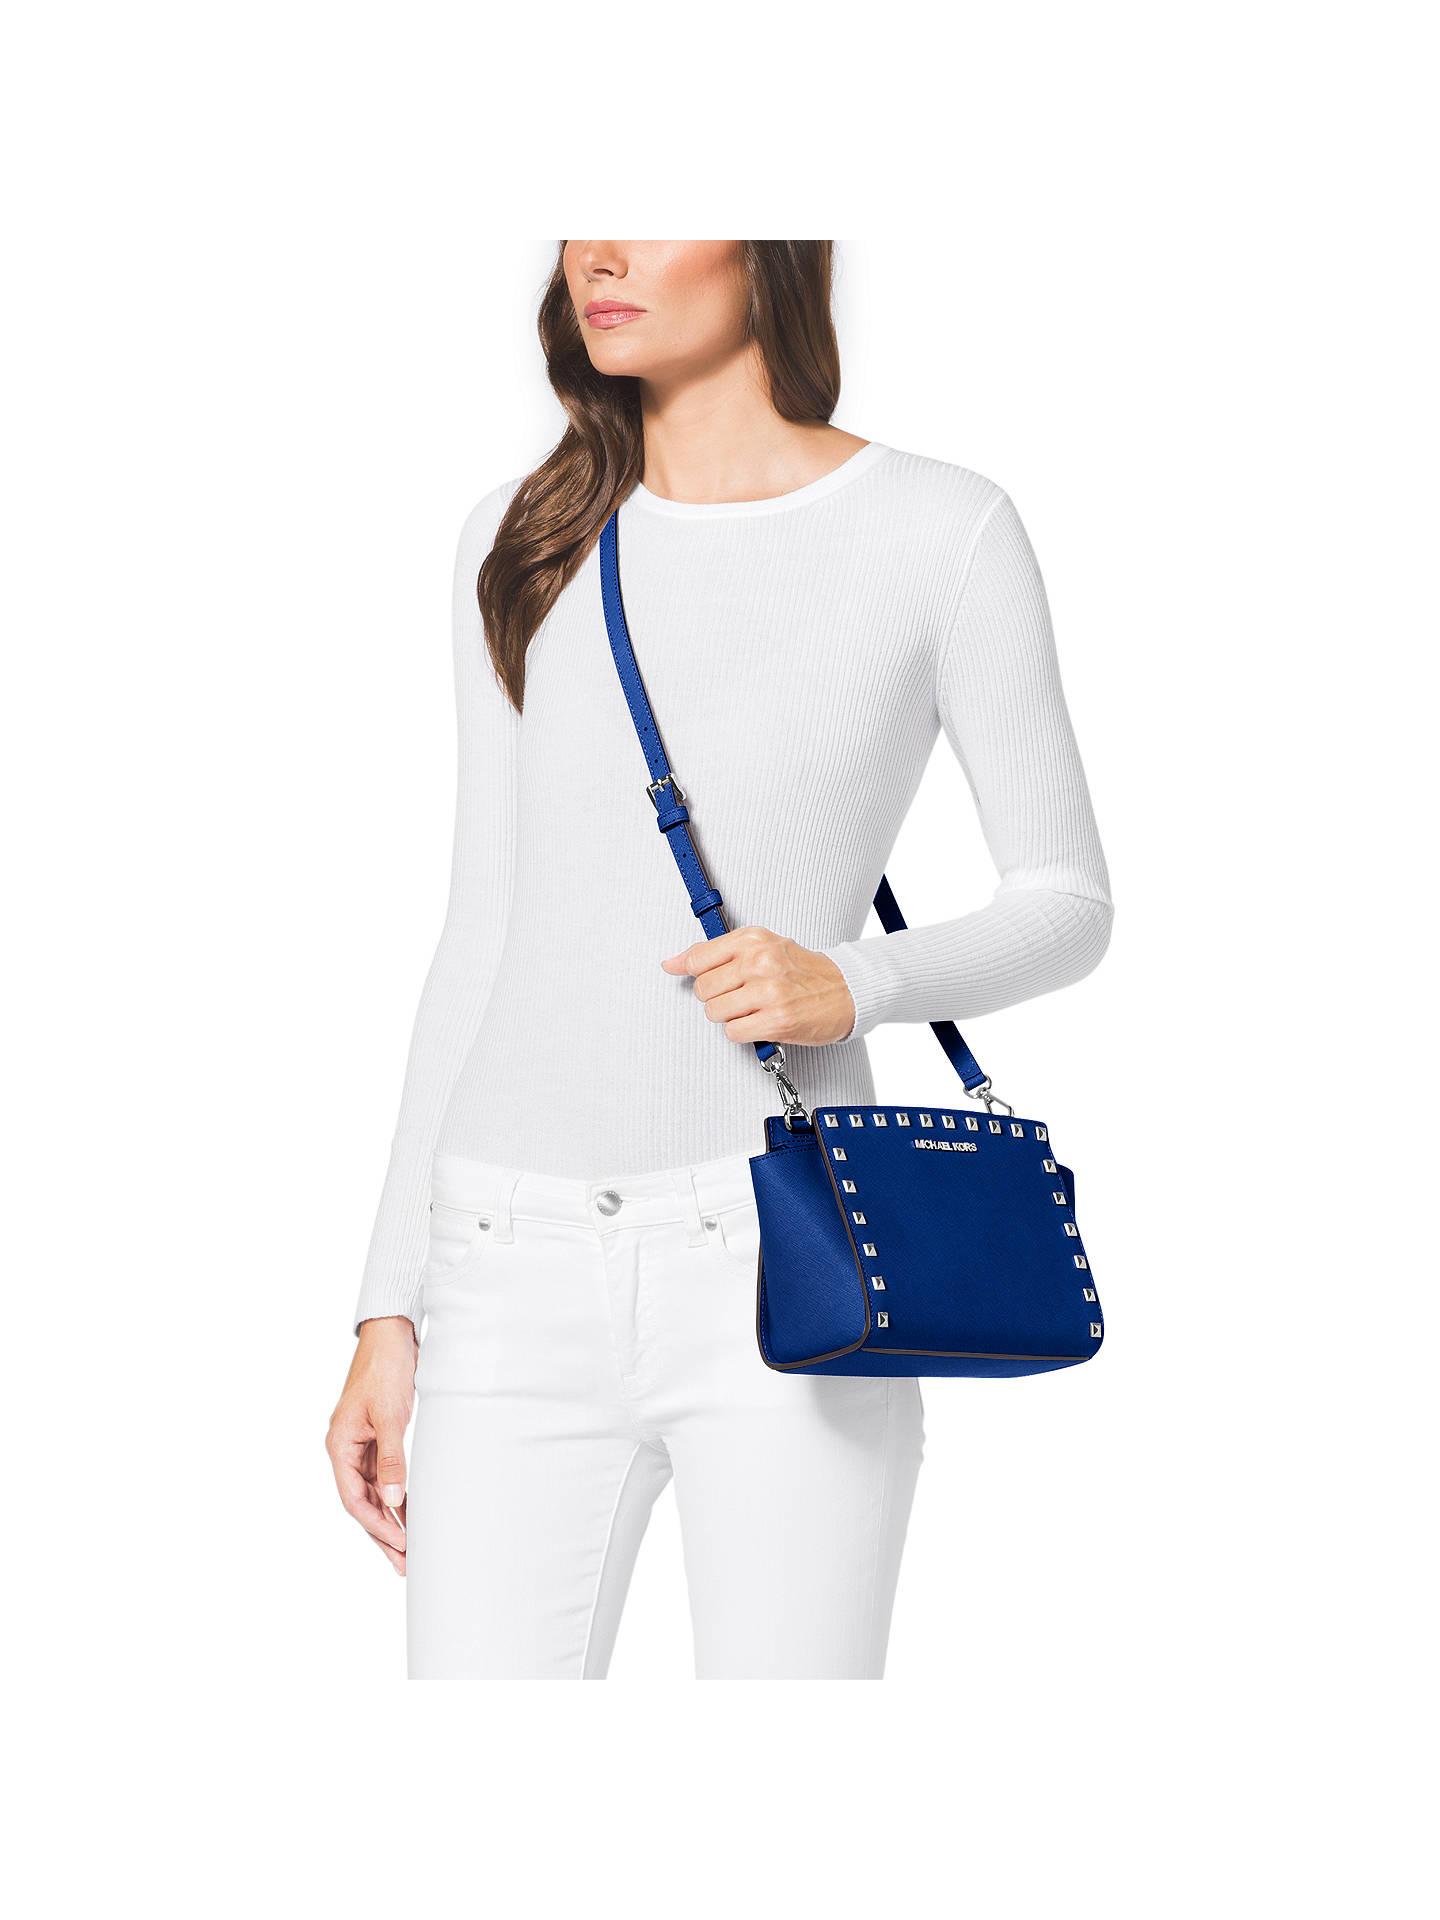 6820c051fffd Buy MICHAEL Michael Kors Selma Stud Medium Leather Messenger Bag, Blue  Online at johnlewis.